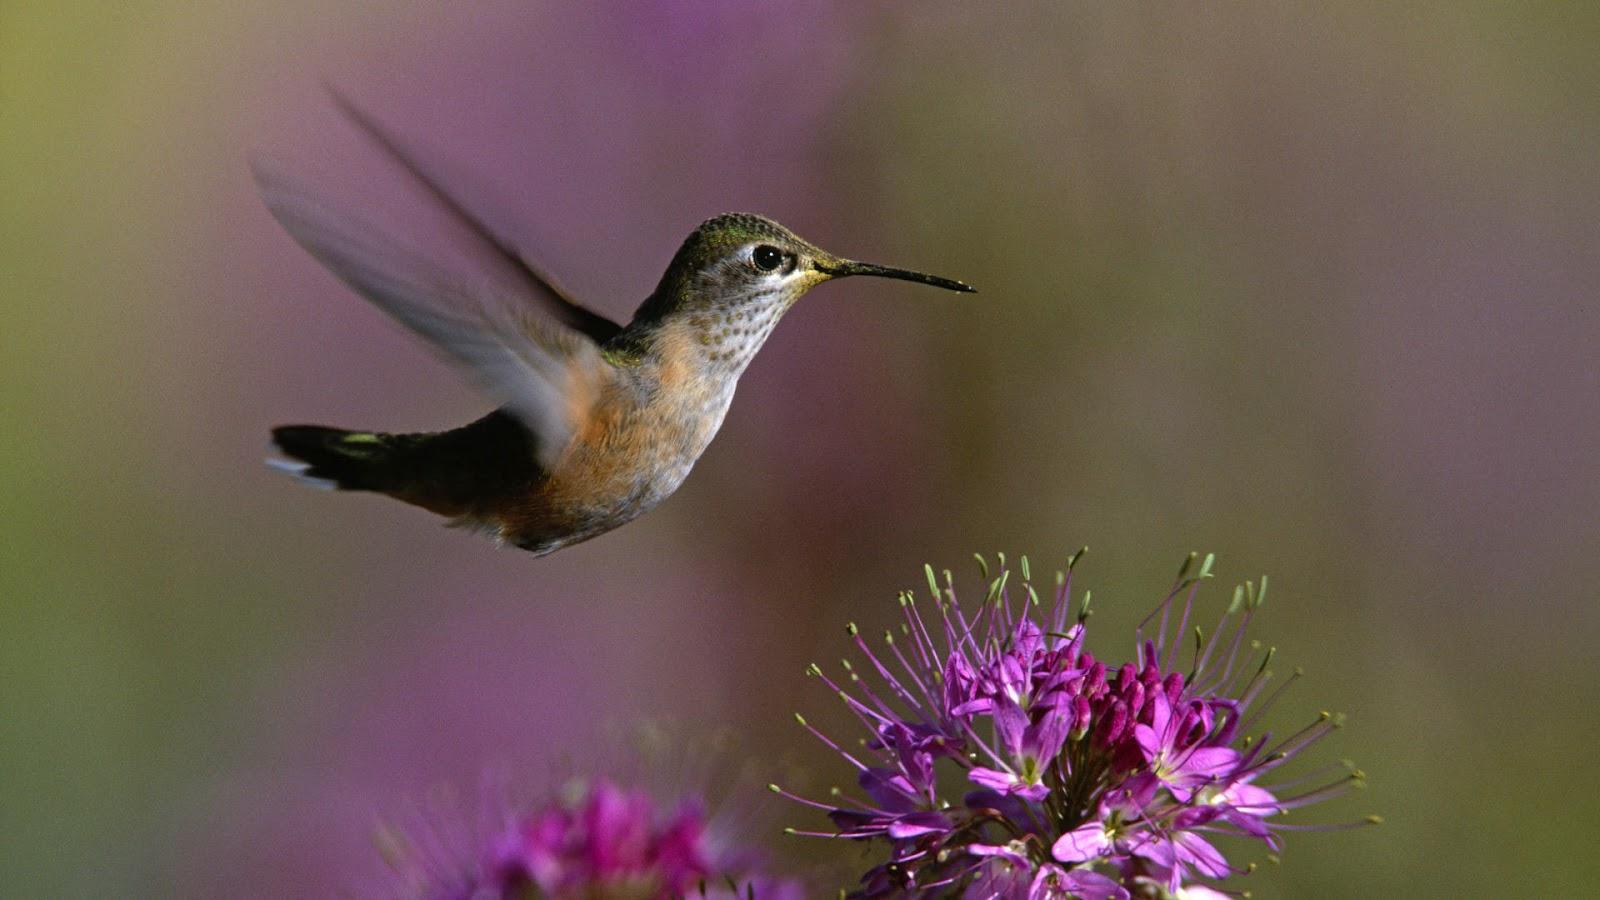 http://4.bp.blogspot.com/-rpTuIyAtaDc/T75yBCwHAxI/AAAAAAAAA2s/_r88mSIUld0/s1600/nature-flowers-bird-background-wallpaper-ajd-1920x1080.jpg